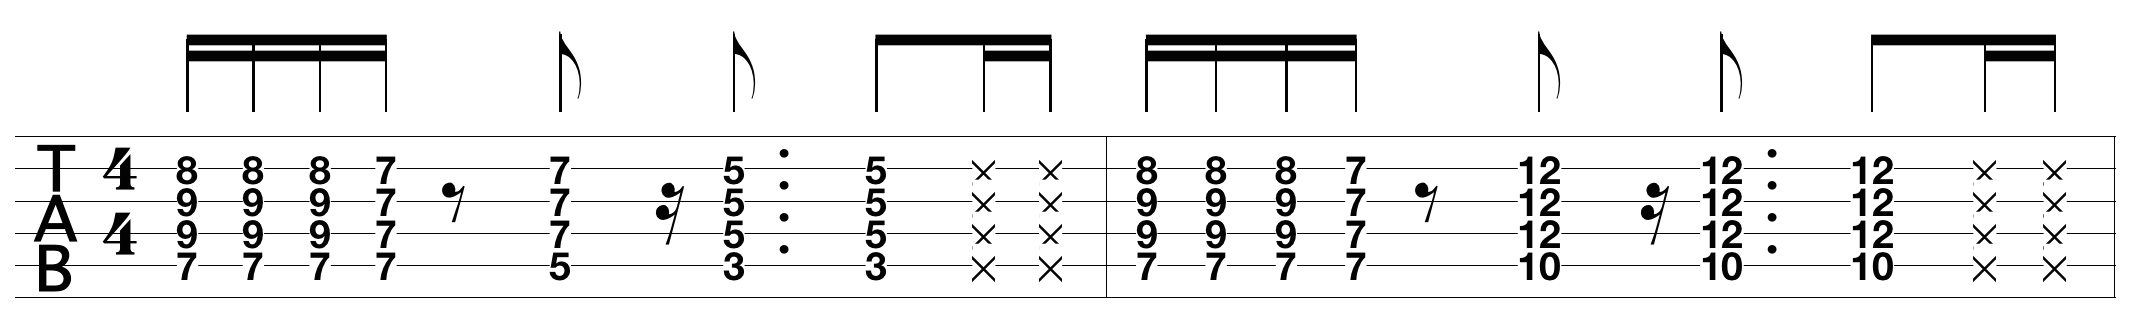 rhythm-guitar-library_1.png